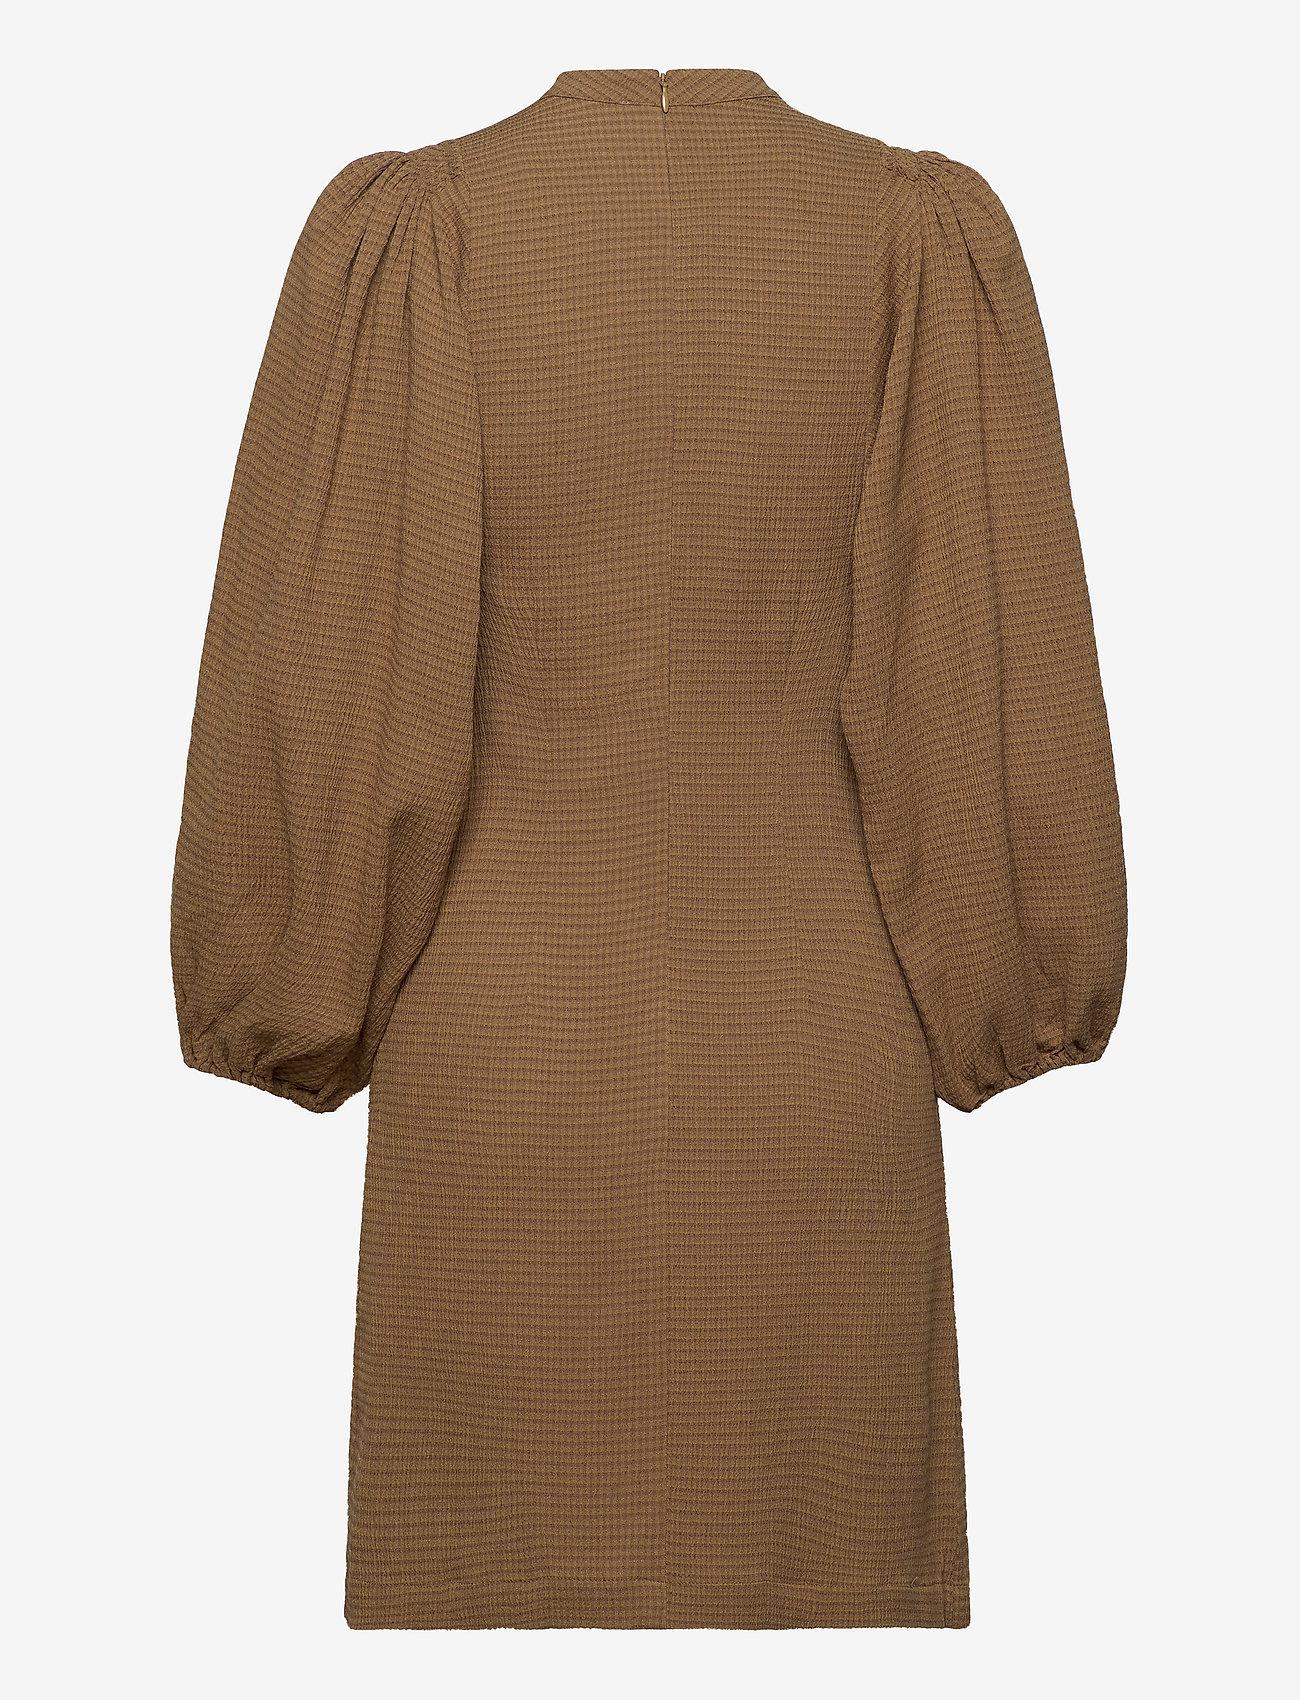 Samsøe Samsøe - Harrietta short dress 11238 - hverdagskjoler - dijon ch - 1